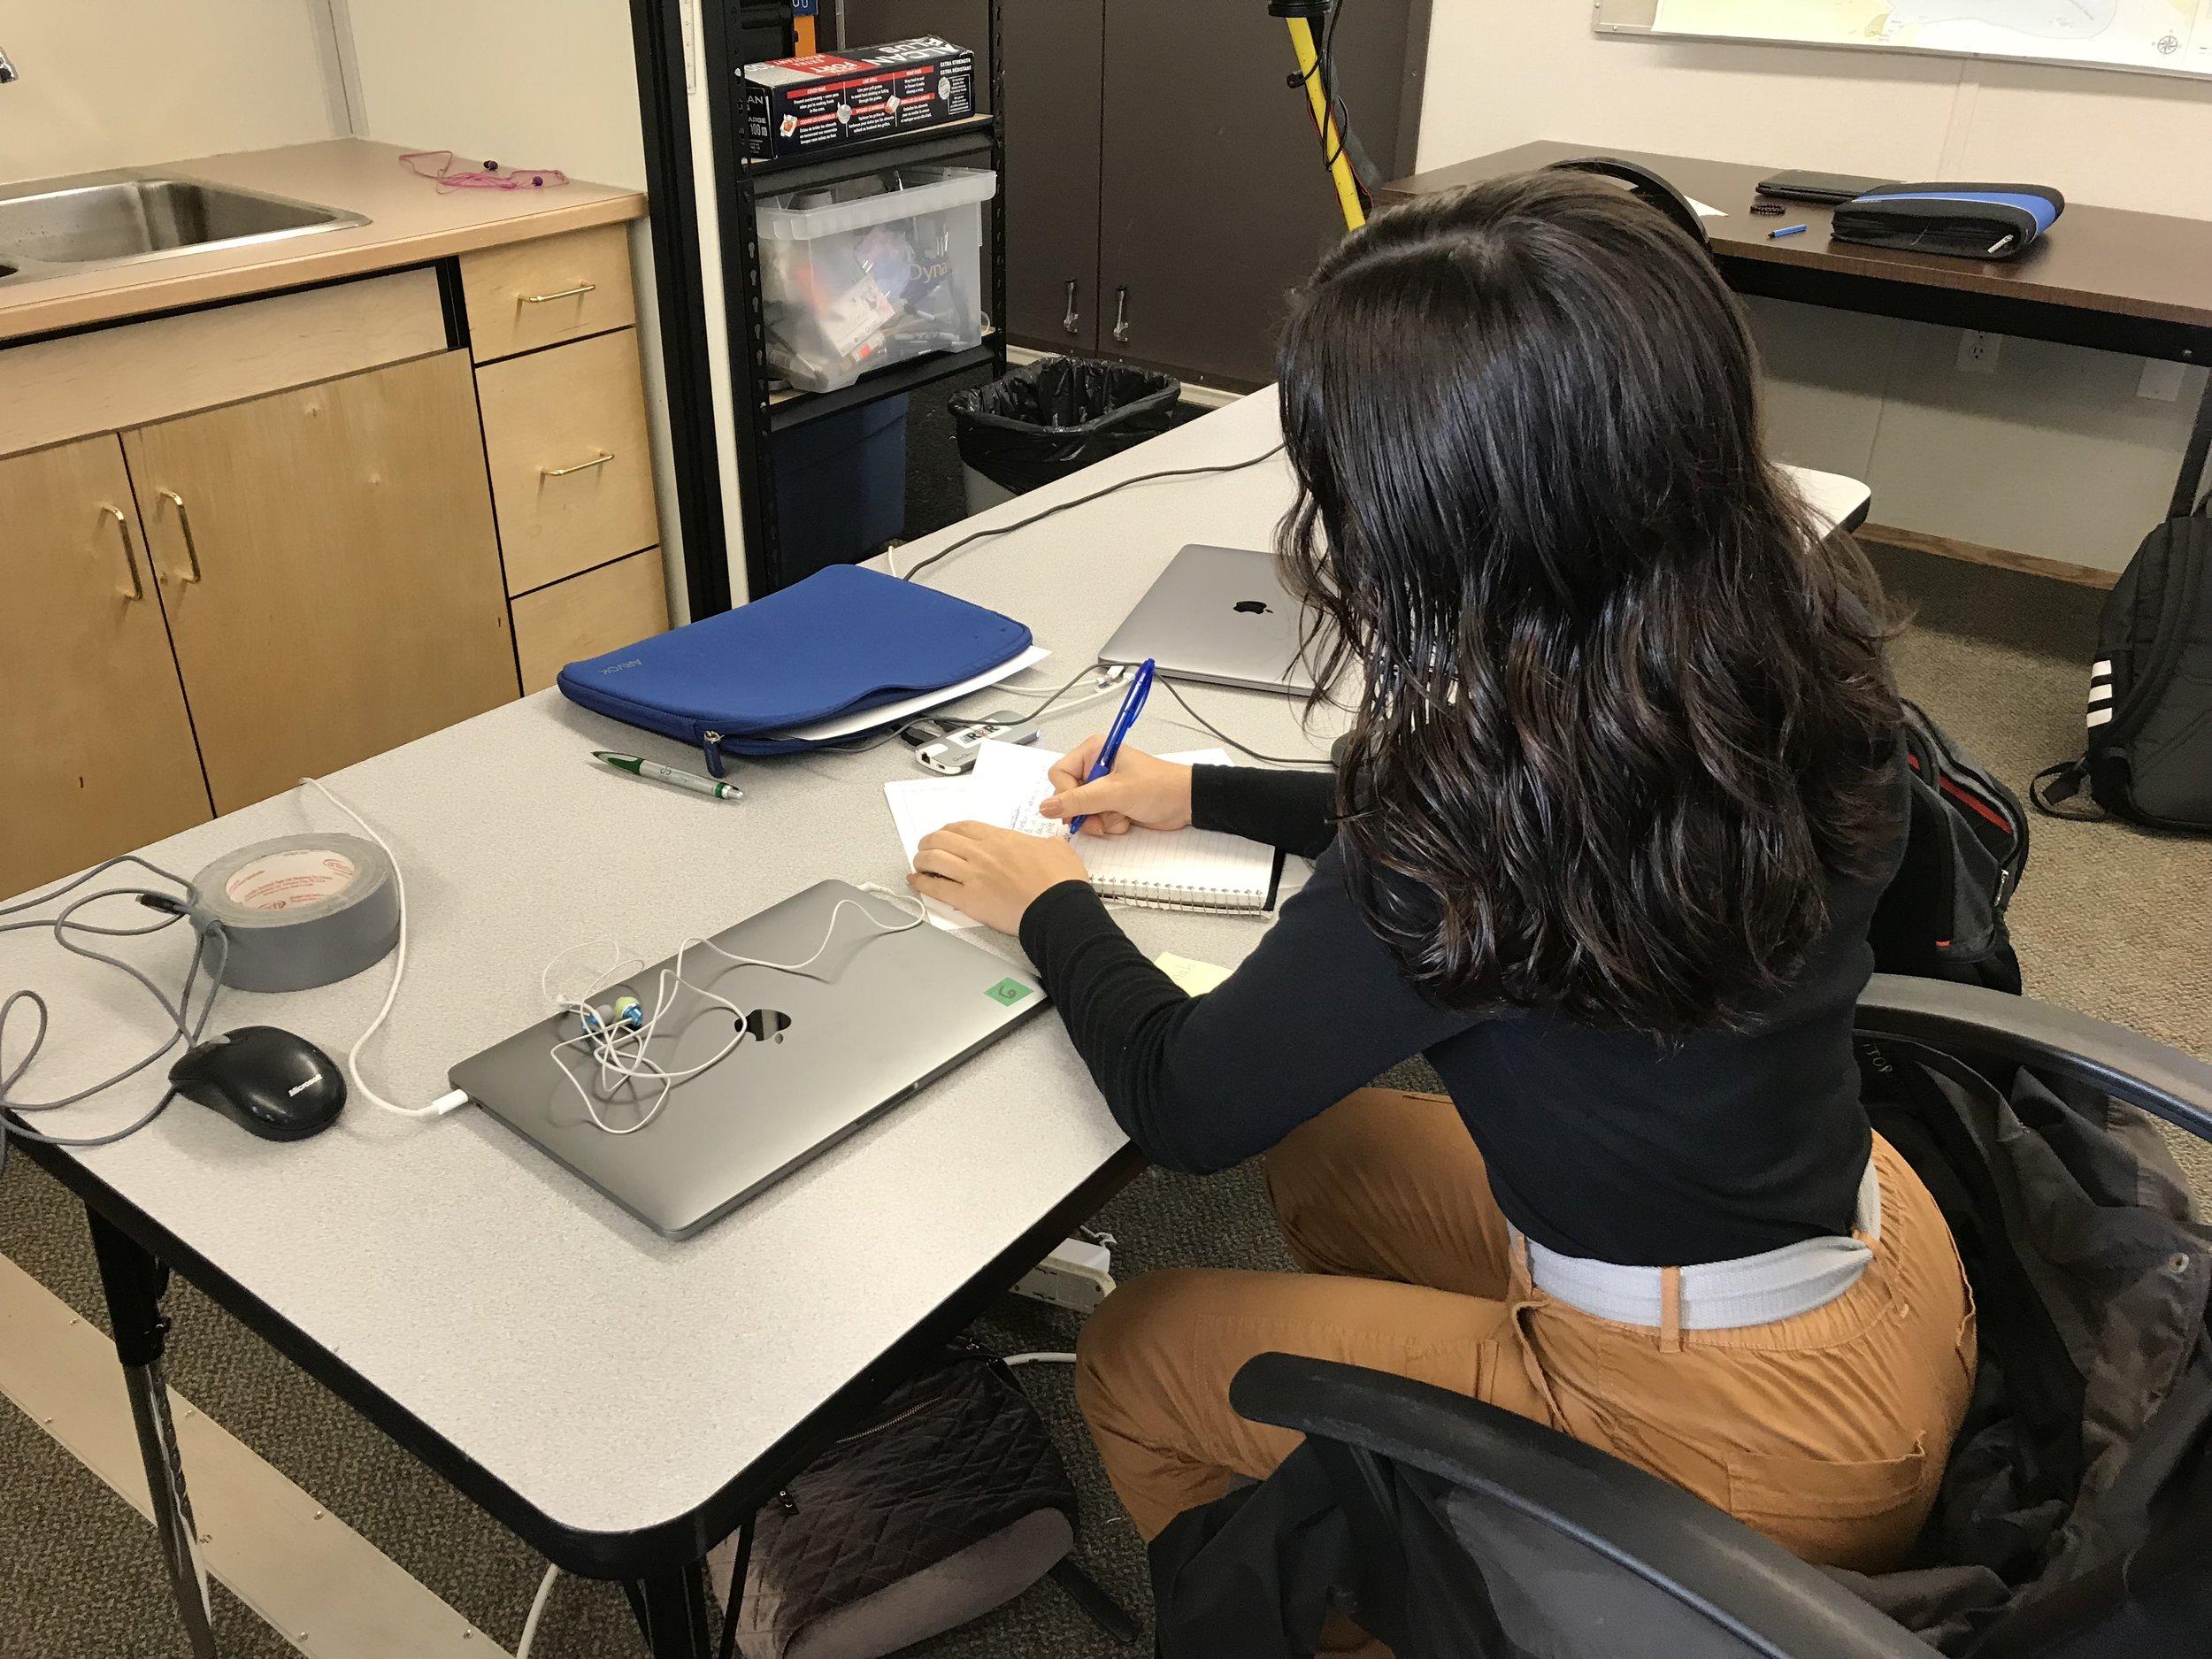 Shekinah works on her story notes